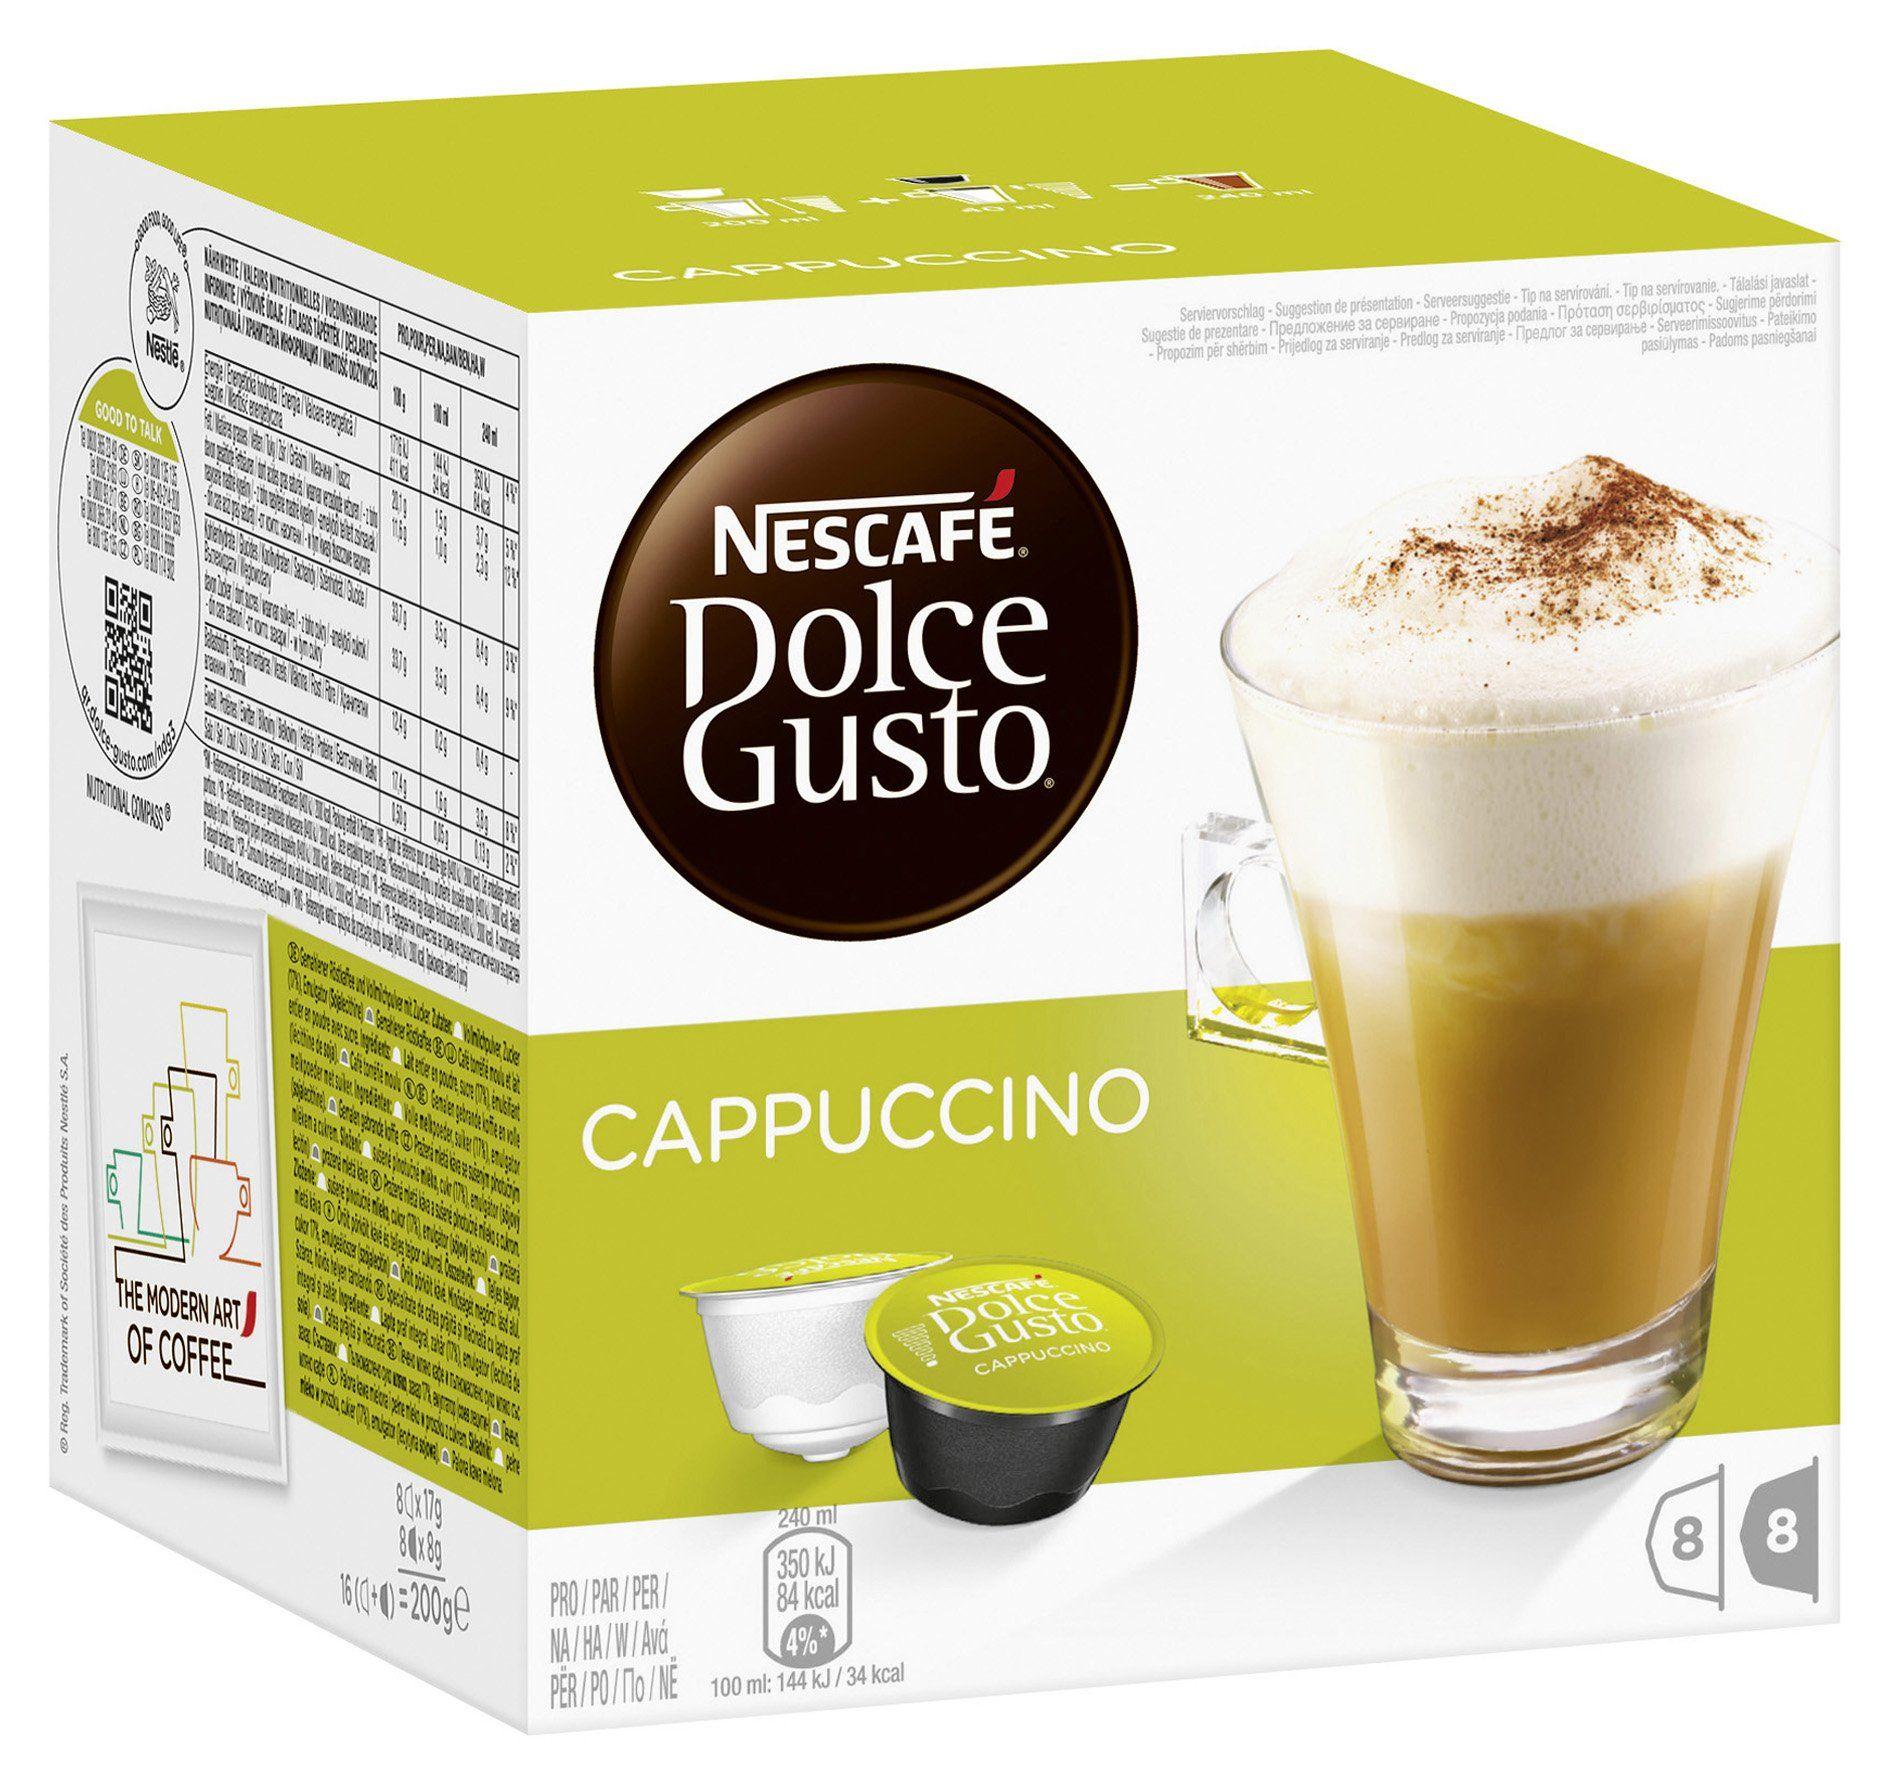 Nescafé Dolce Gusto Cappuccino 16 Capsules (Pack of 3